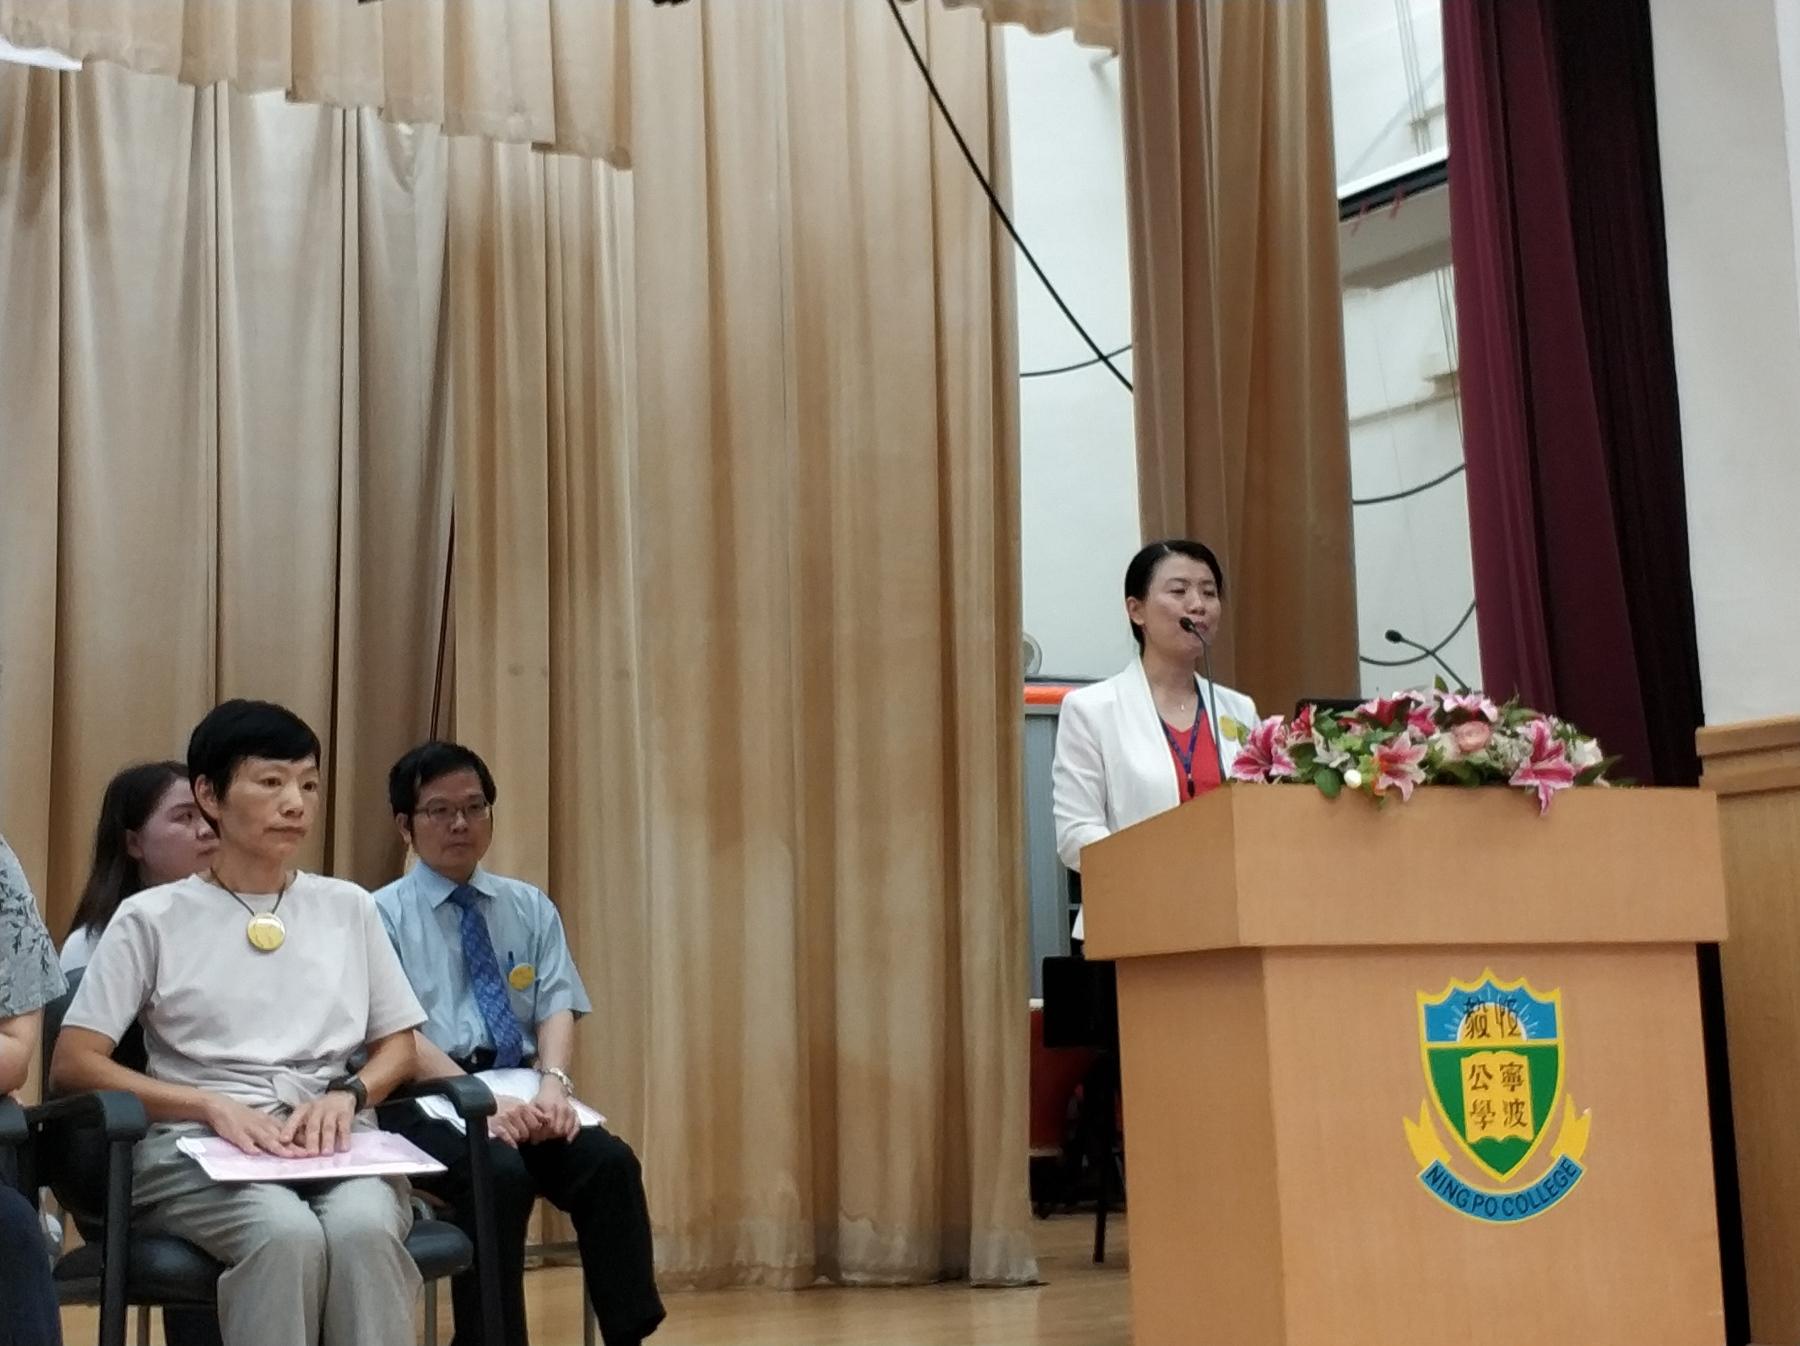 https://npc.edu.hk/sites/default/files/img_20190811_100934.jpg